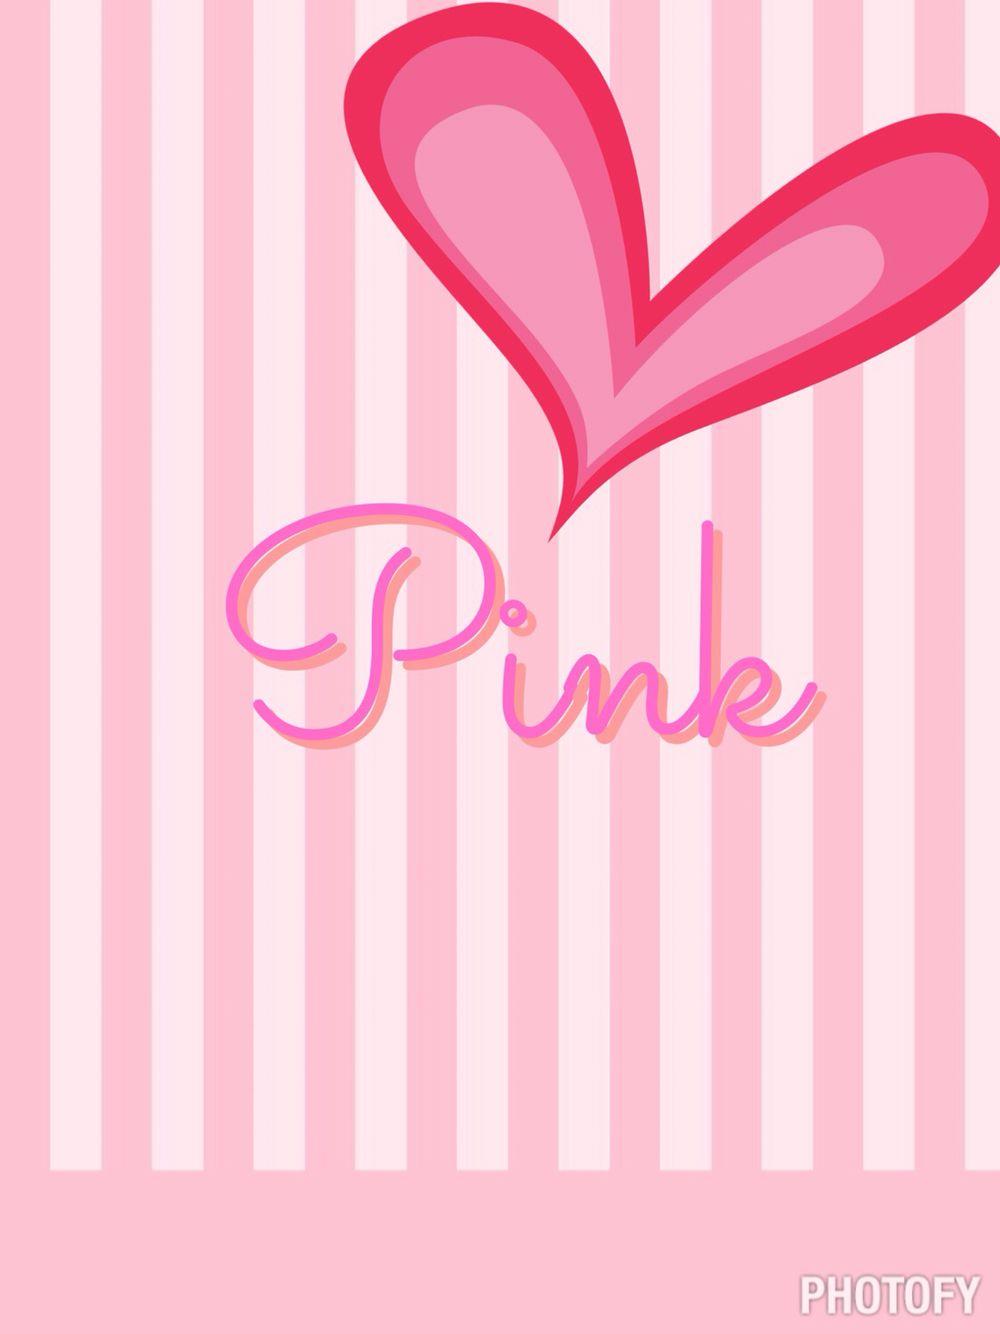 Pin By Chiitan On Pink Wallpaper Pink Wallpaper Pink Themes Victoria Secret Wallpaper